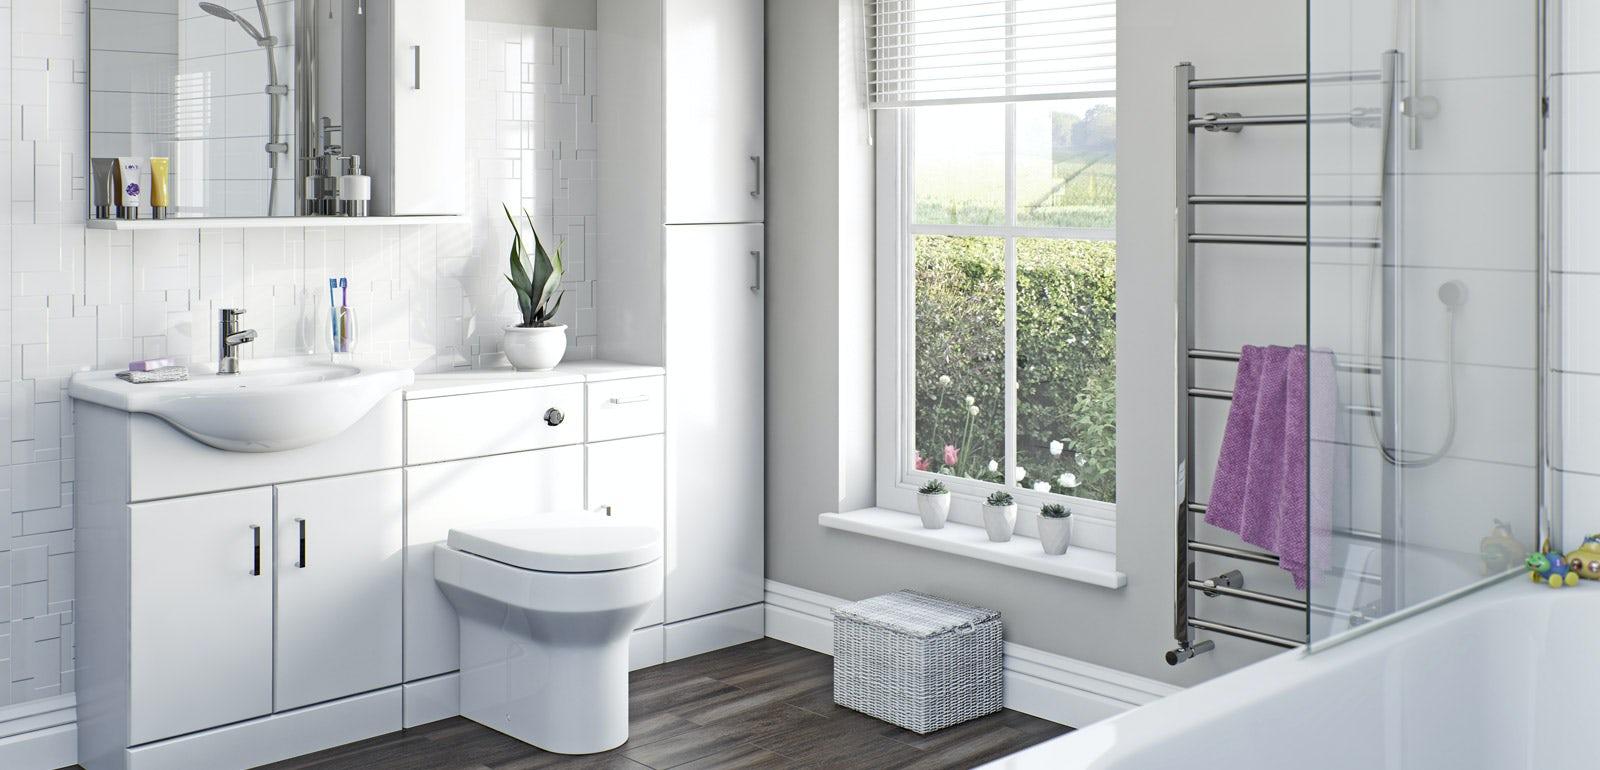 White gloss bathroom furniture - Sienna White Bathroom Furniture